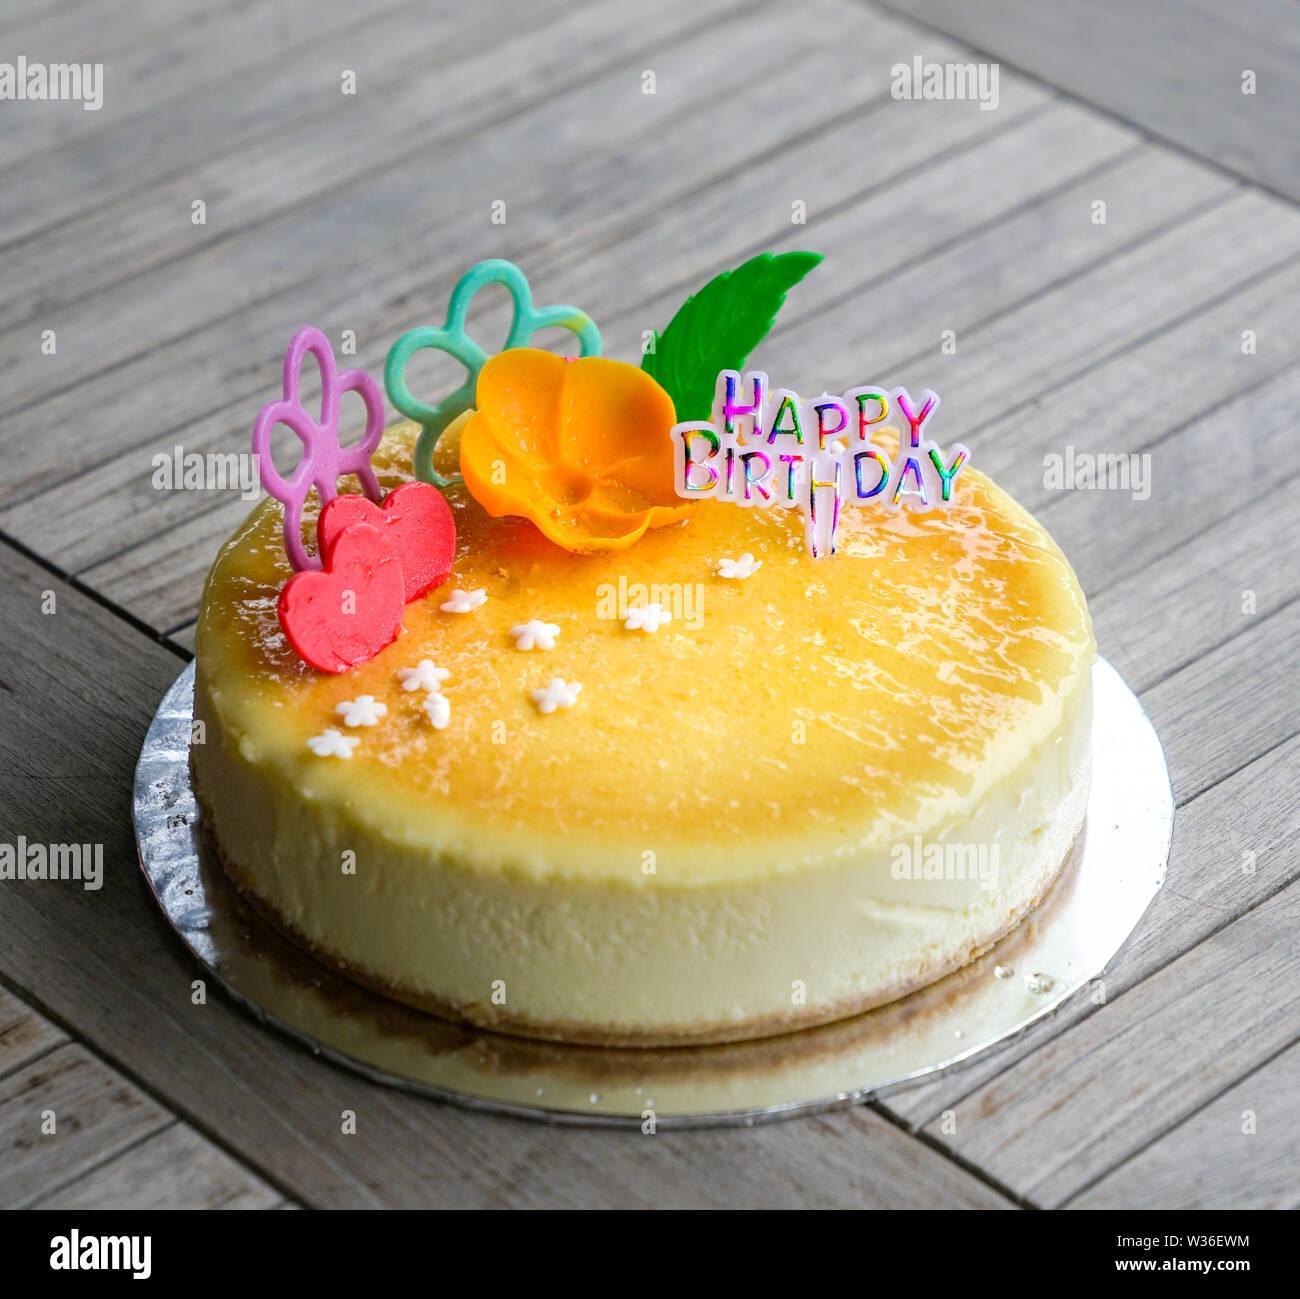 Marvelous Cheese Cake For Birthday Celebration Stock Photo 260142896 Alamy Funny Birthday Cards Online Amentibdeldamsfinfo